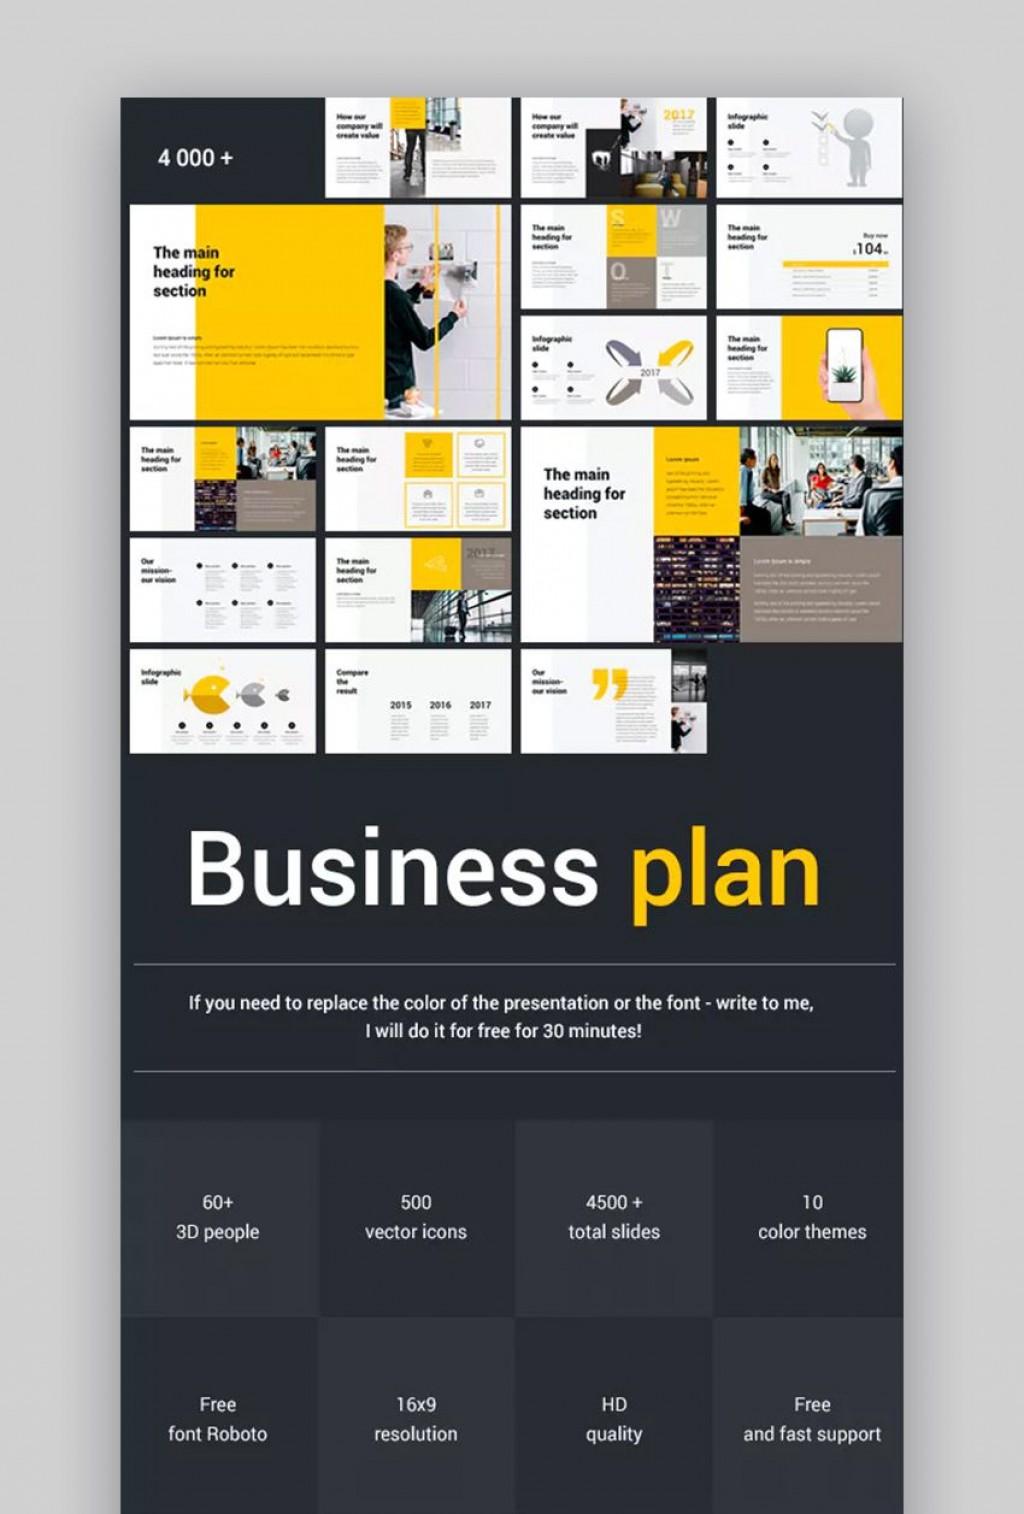 004 Singular Free Busines Proposal Template Ppt Inspiration  Best Plan 2020Large